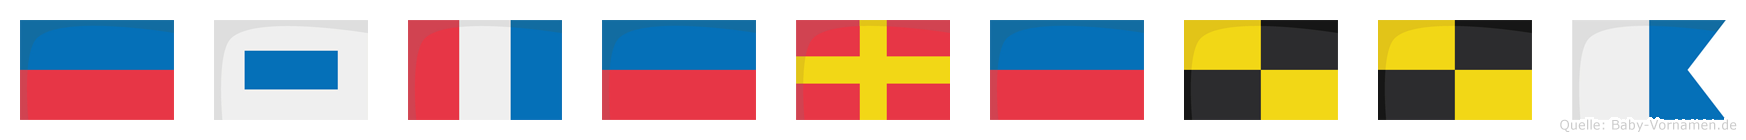 Esterella im Flaggenalphabet